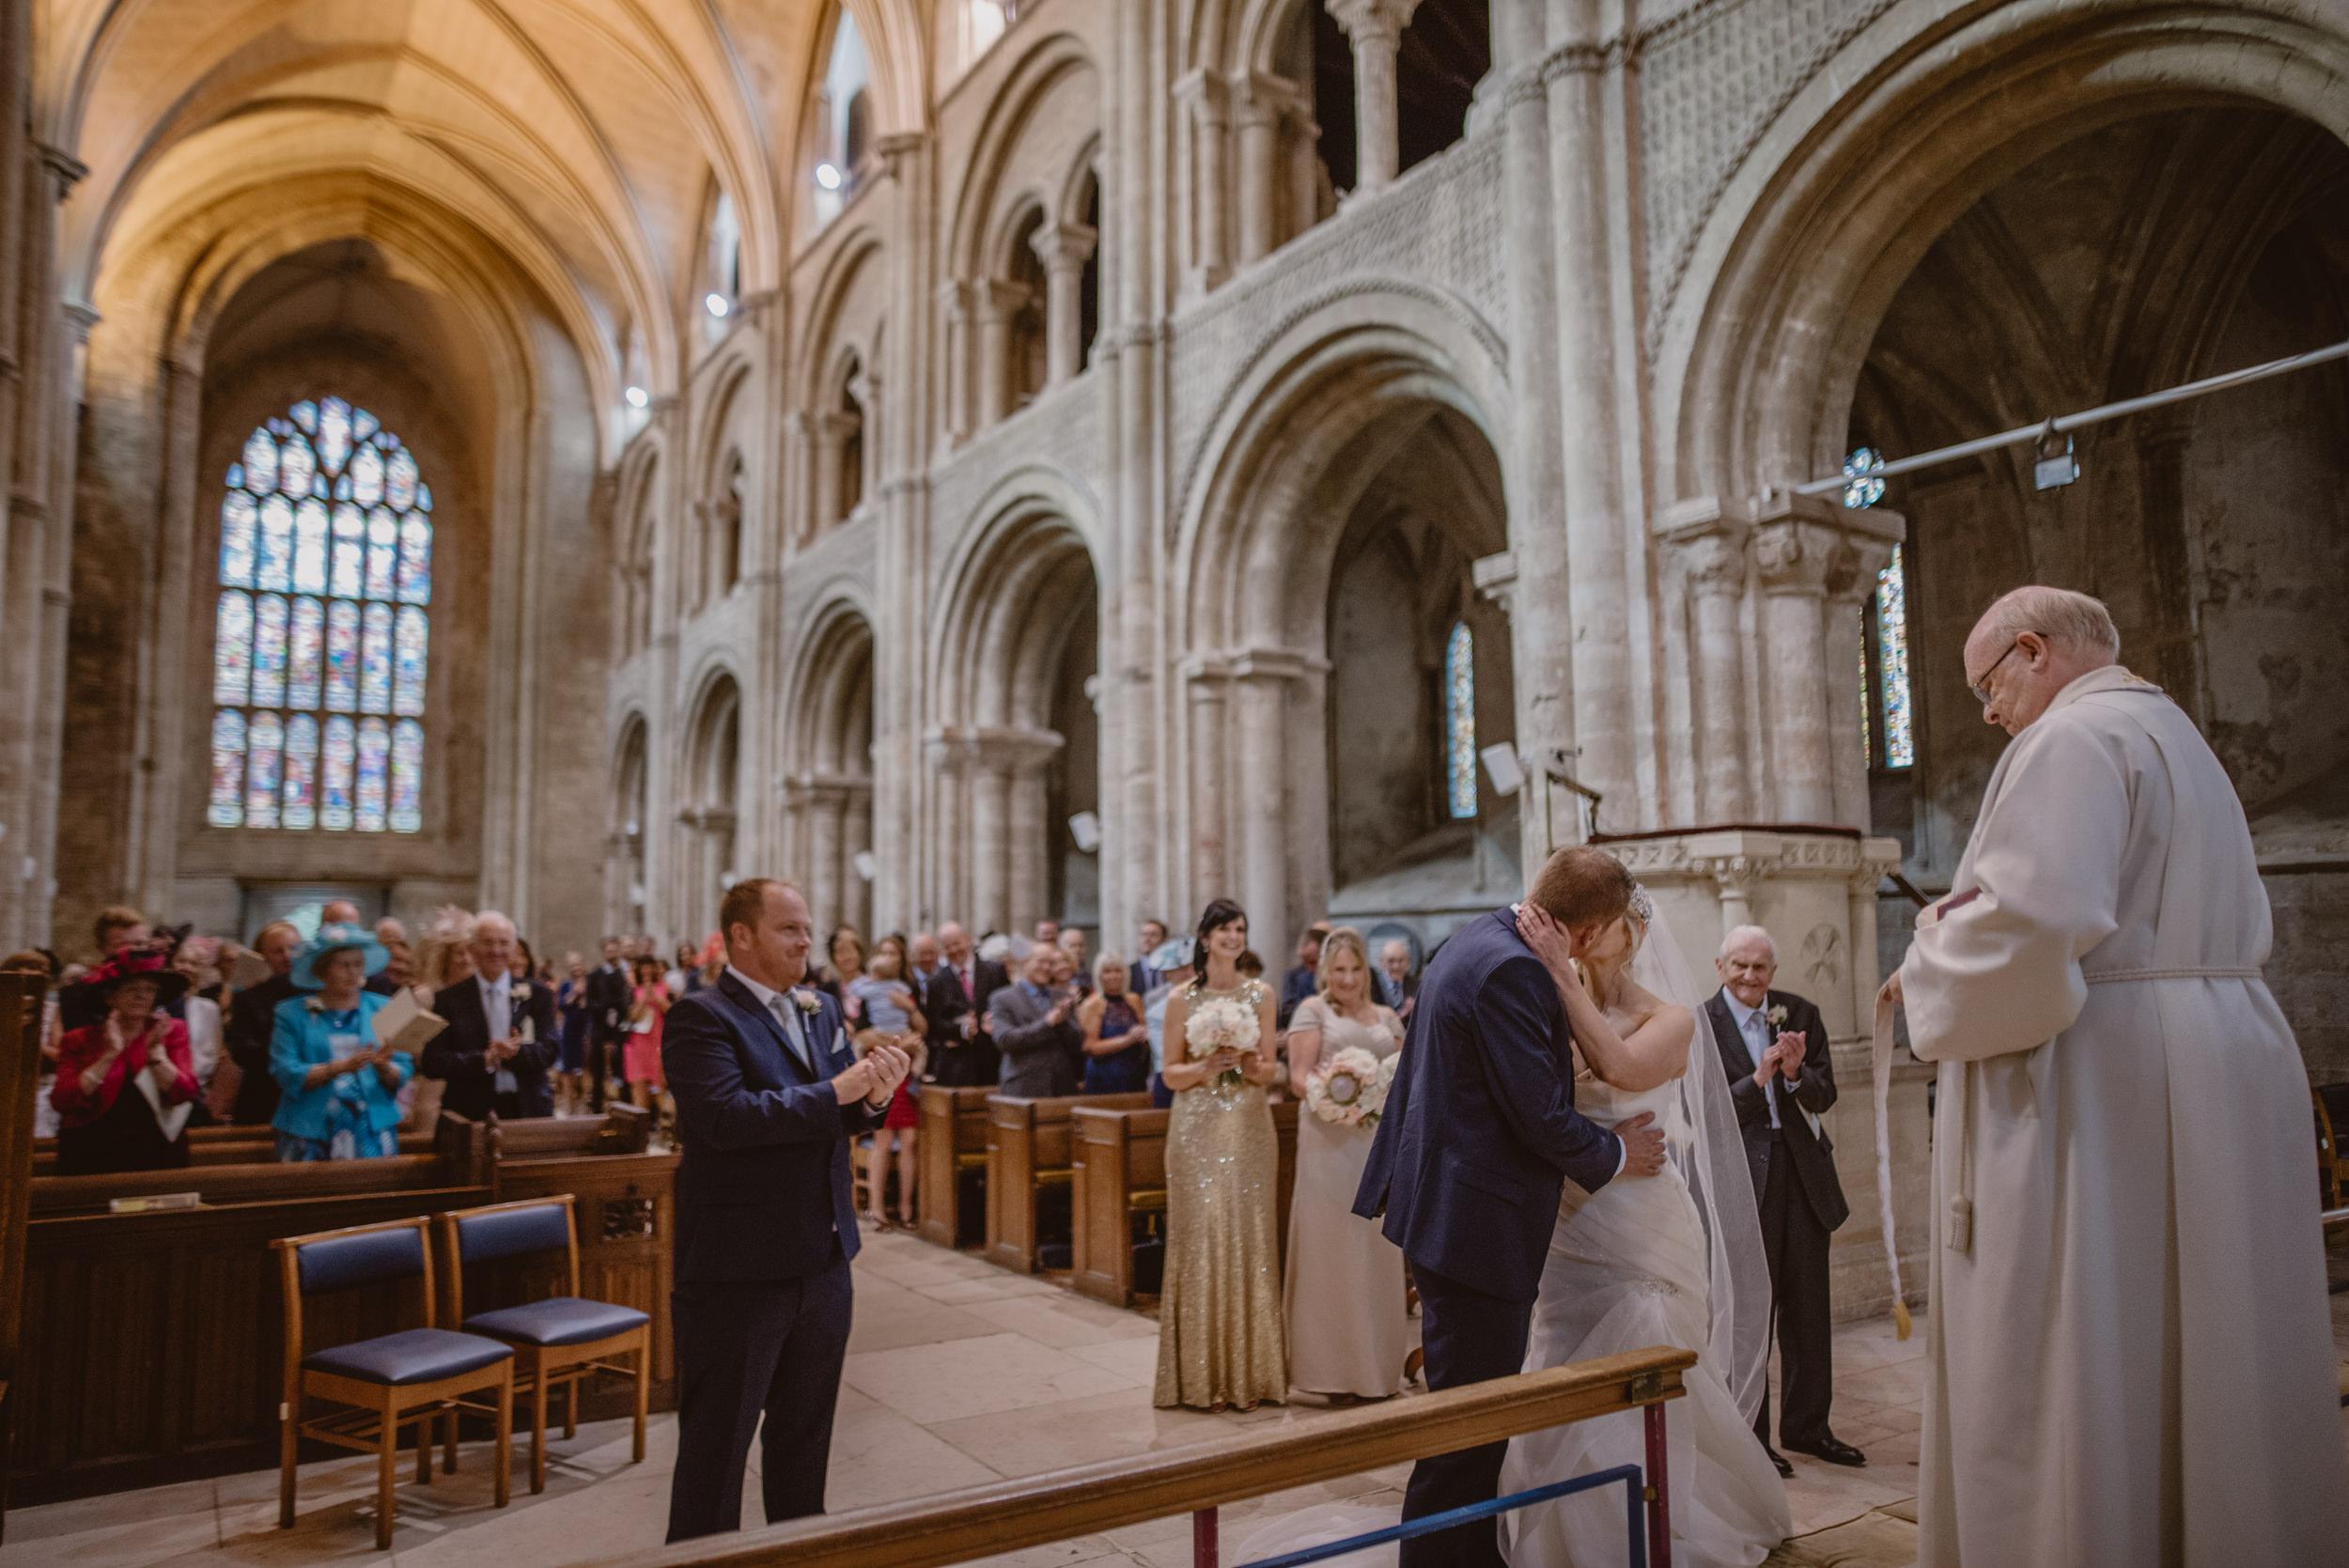 Trisha-and-Roger-wedding-The-Priory-Church-and-Chewton-Glen-Hotel-Christchurch-Manu-Mendoza-Wedding-Photography-169.jpg